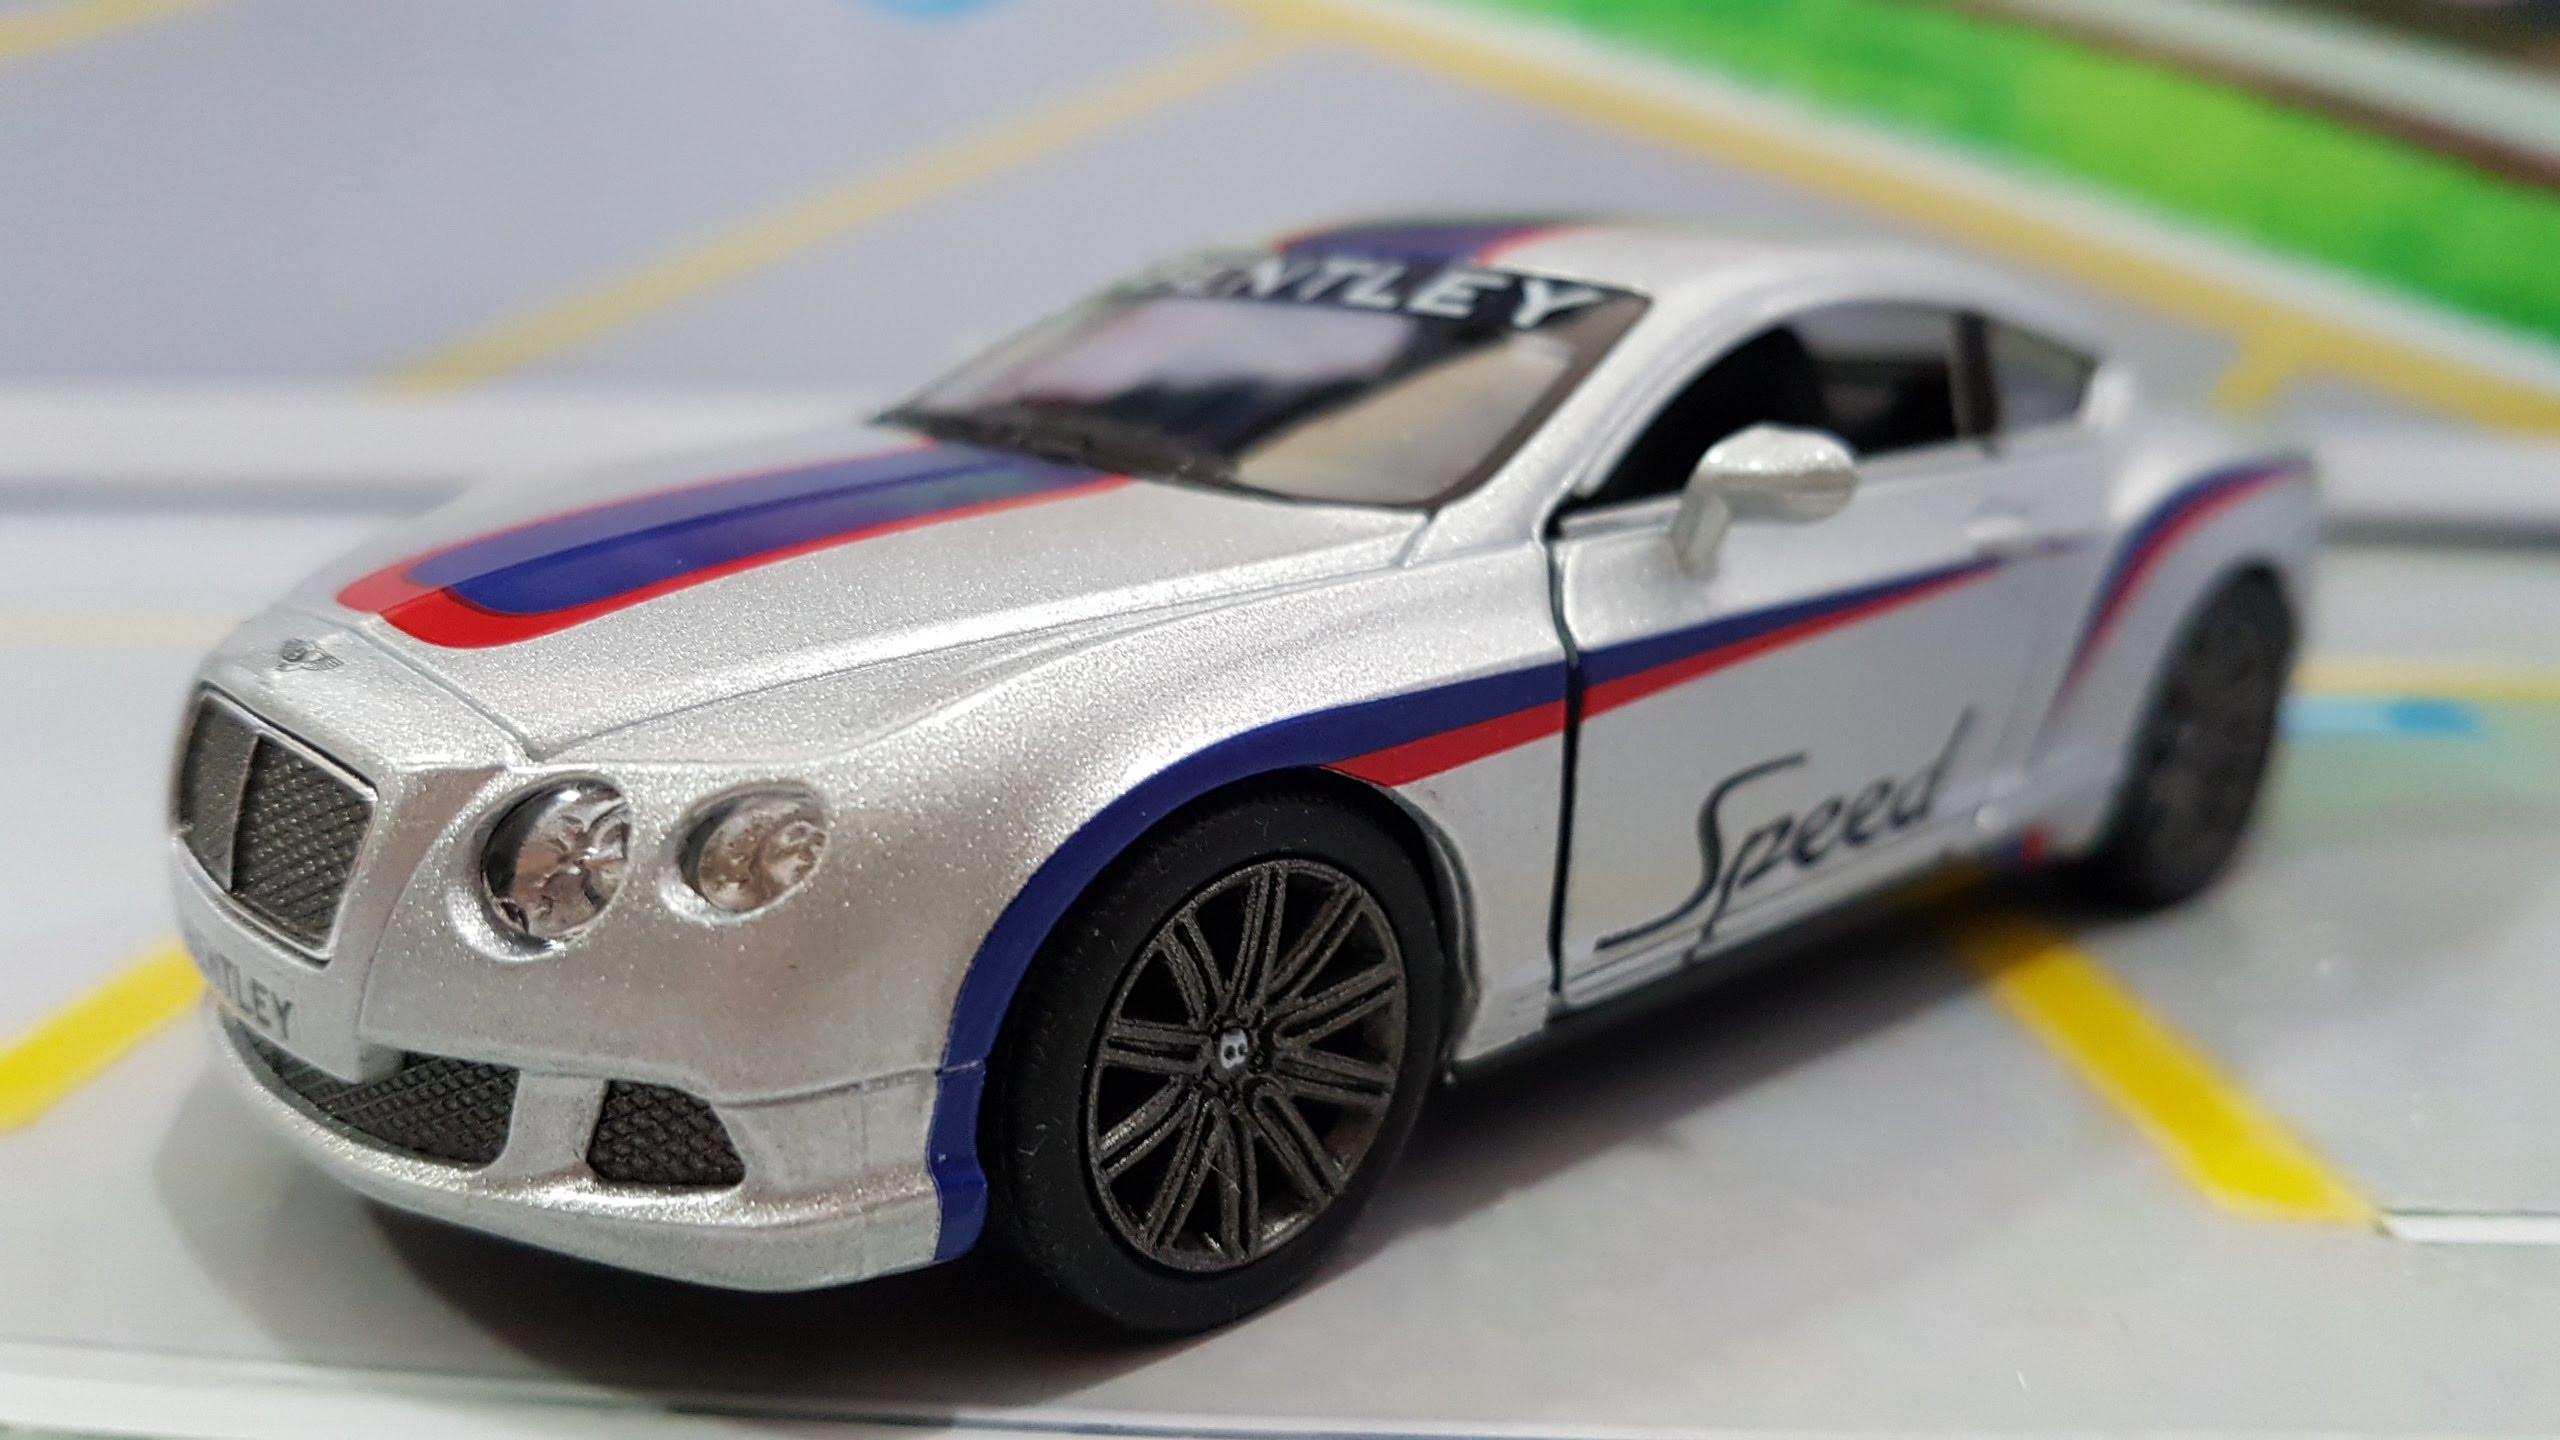 Bentley Continental GT Speed 2012 Prata com faixa Azul 1:38 Kinsmart